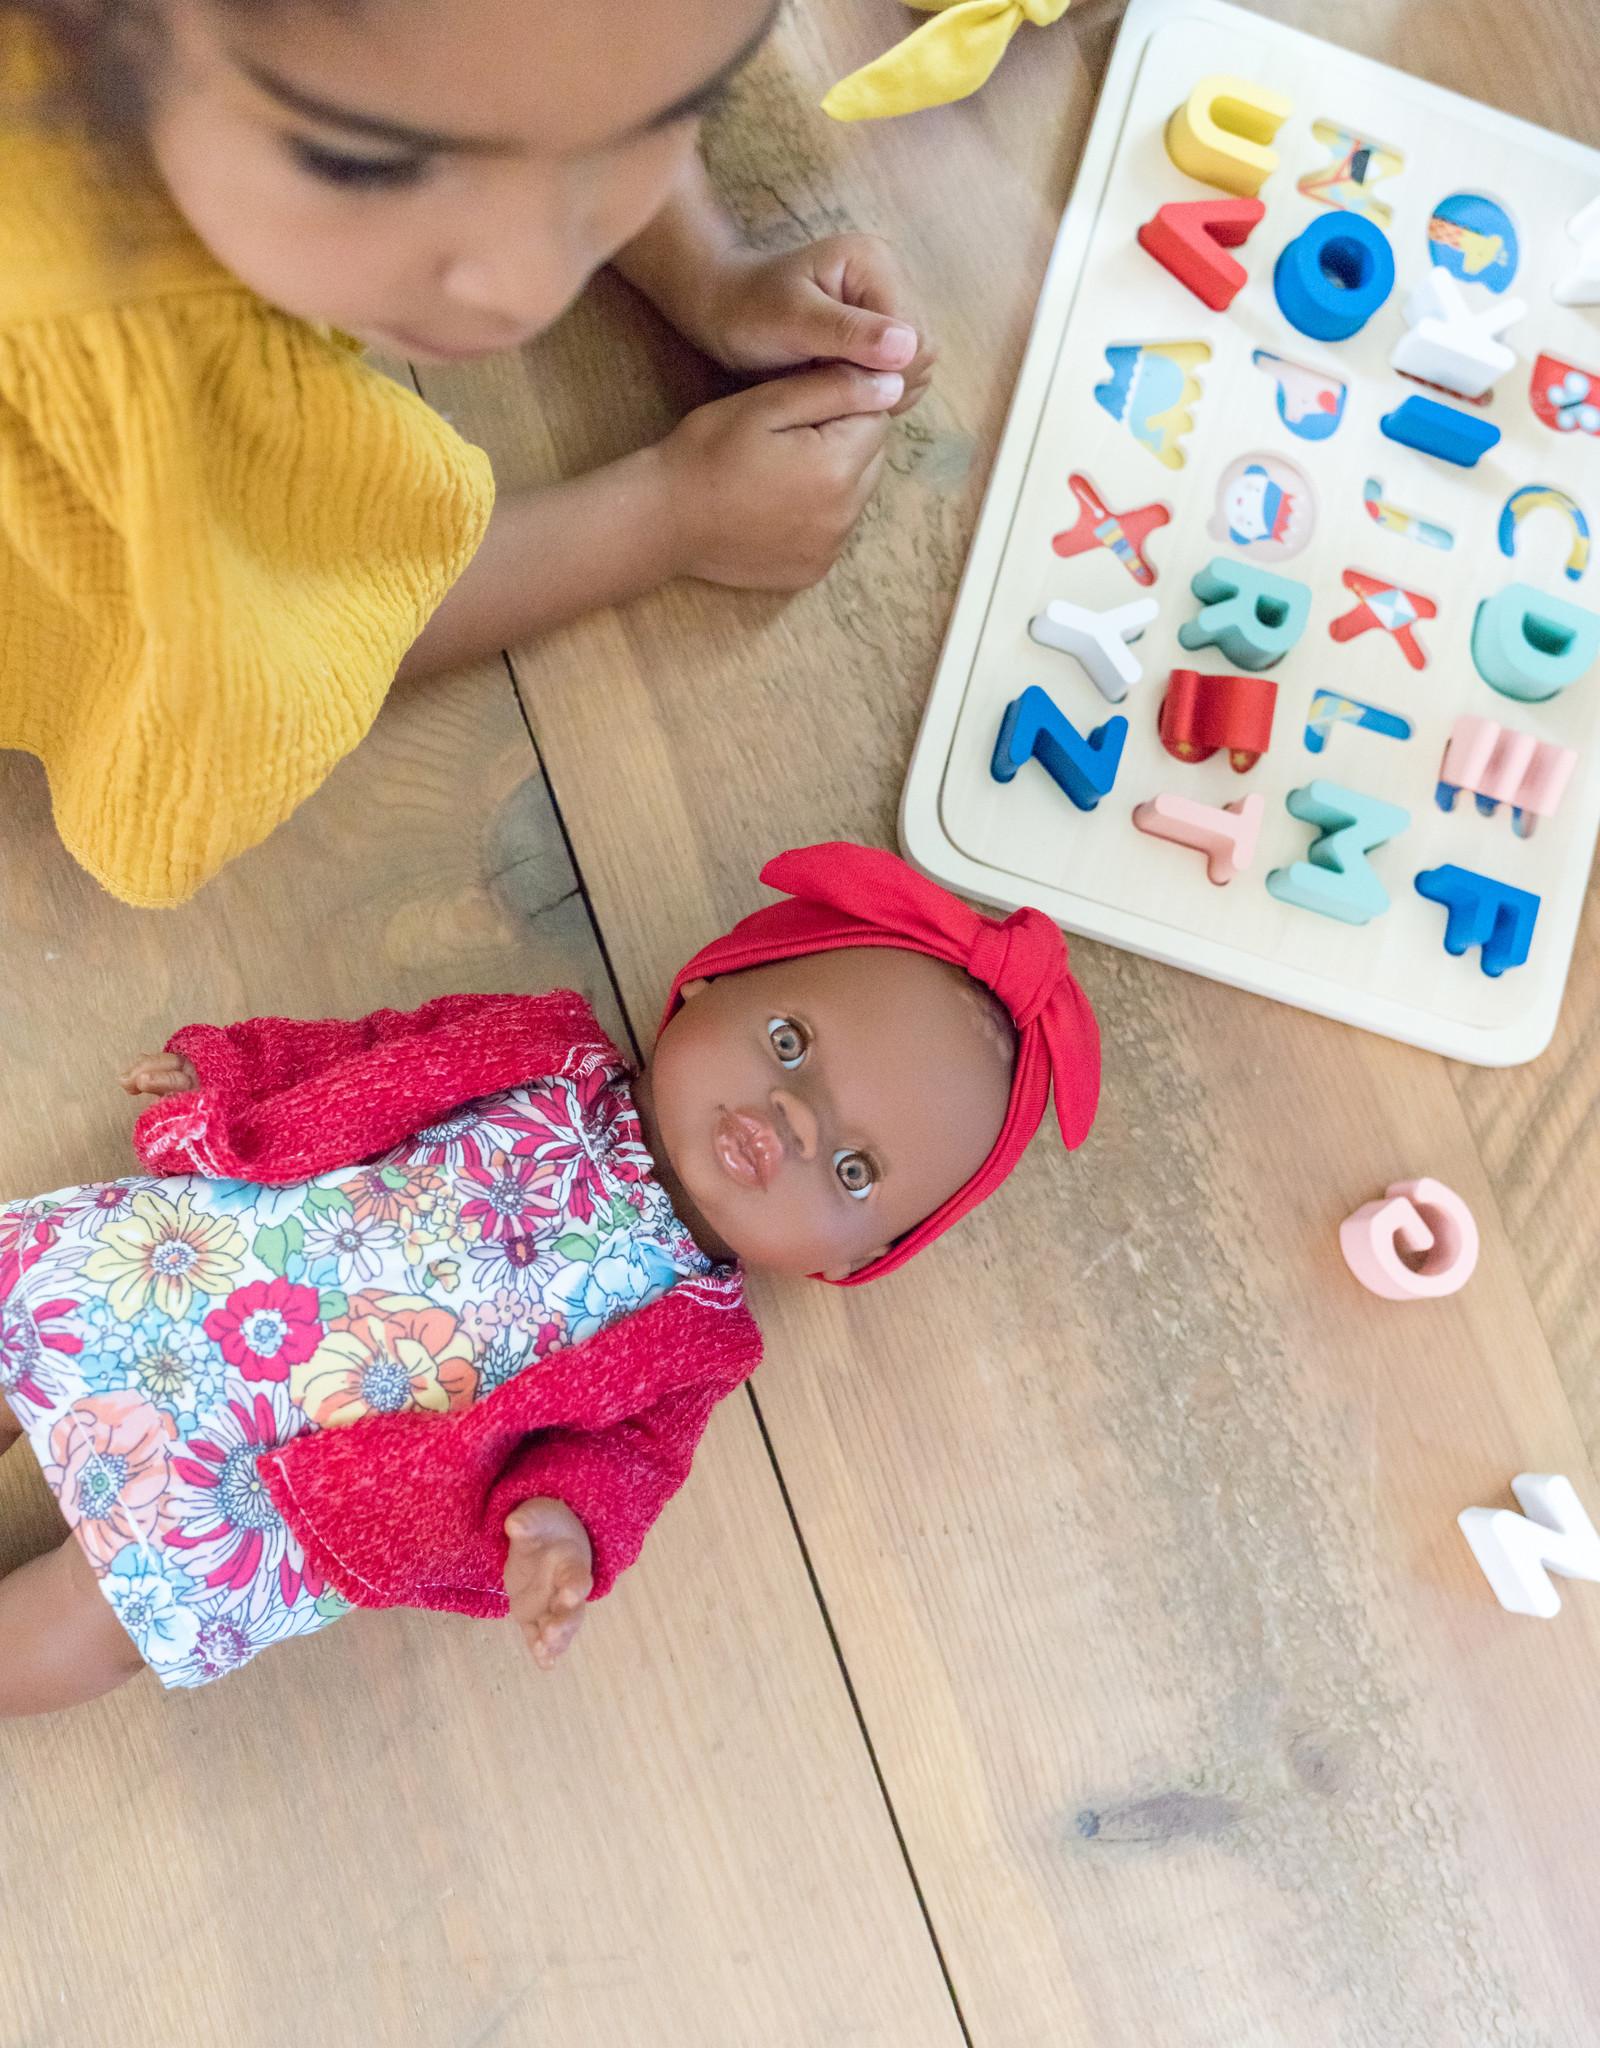 Paola Reina Bébé Gordis - Ruby en pyjama